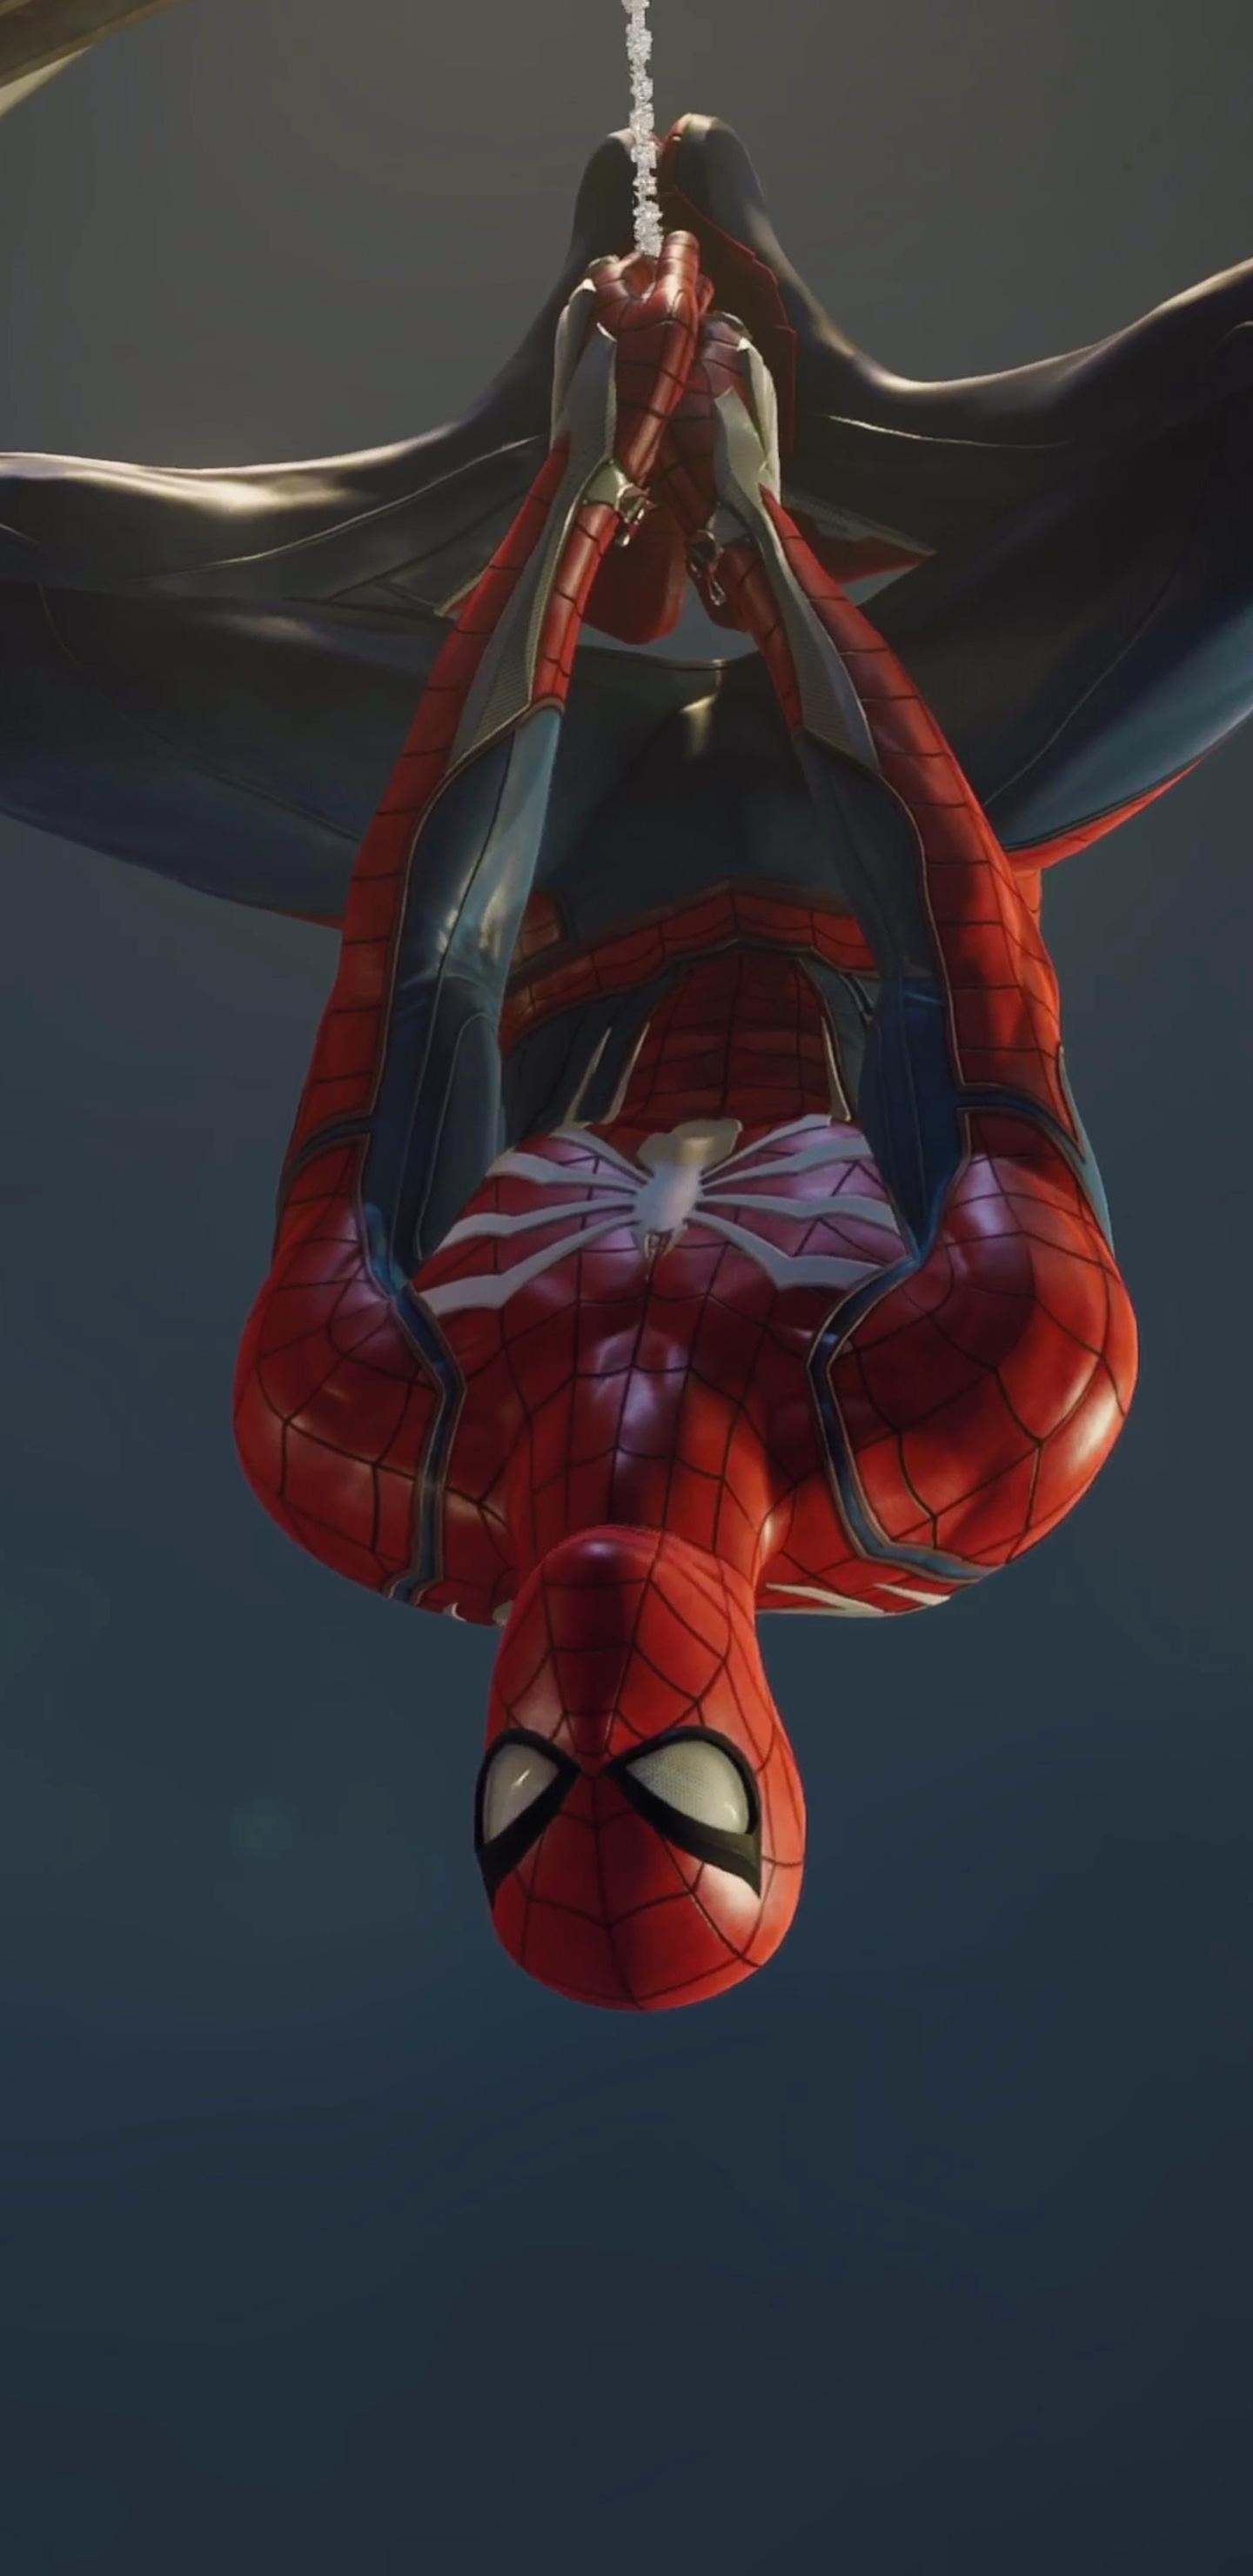 1440x2960 Spiderman 2017 Video Game Samsung Galaxy Note 9